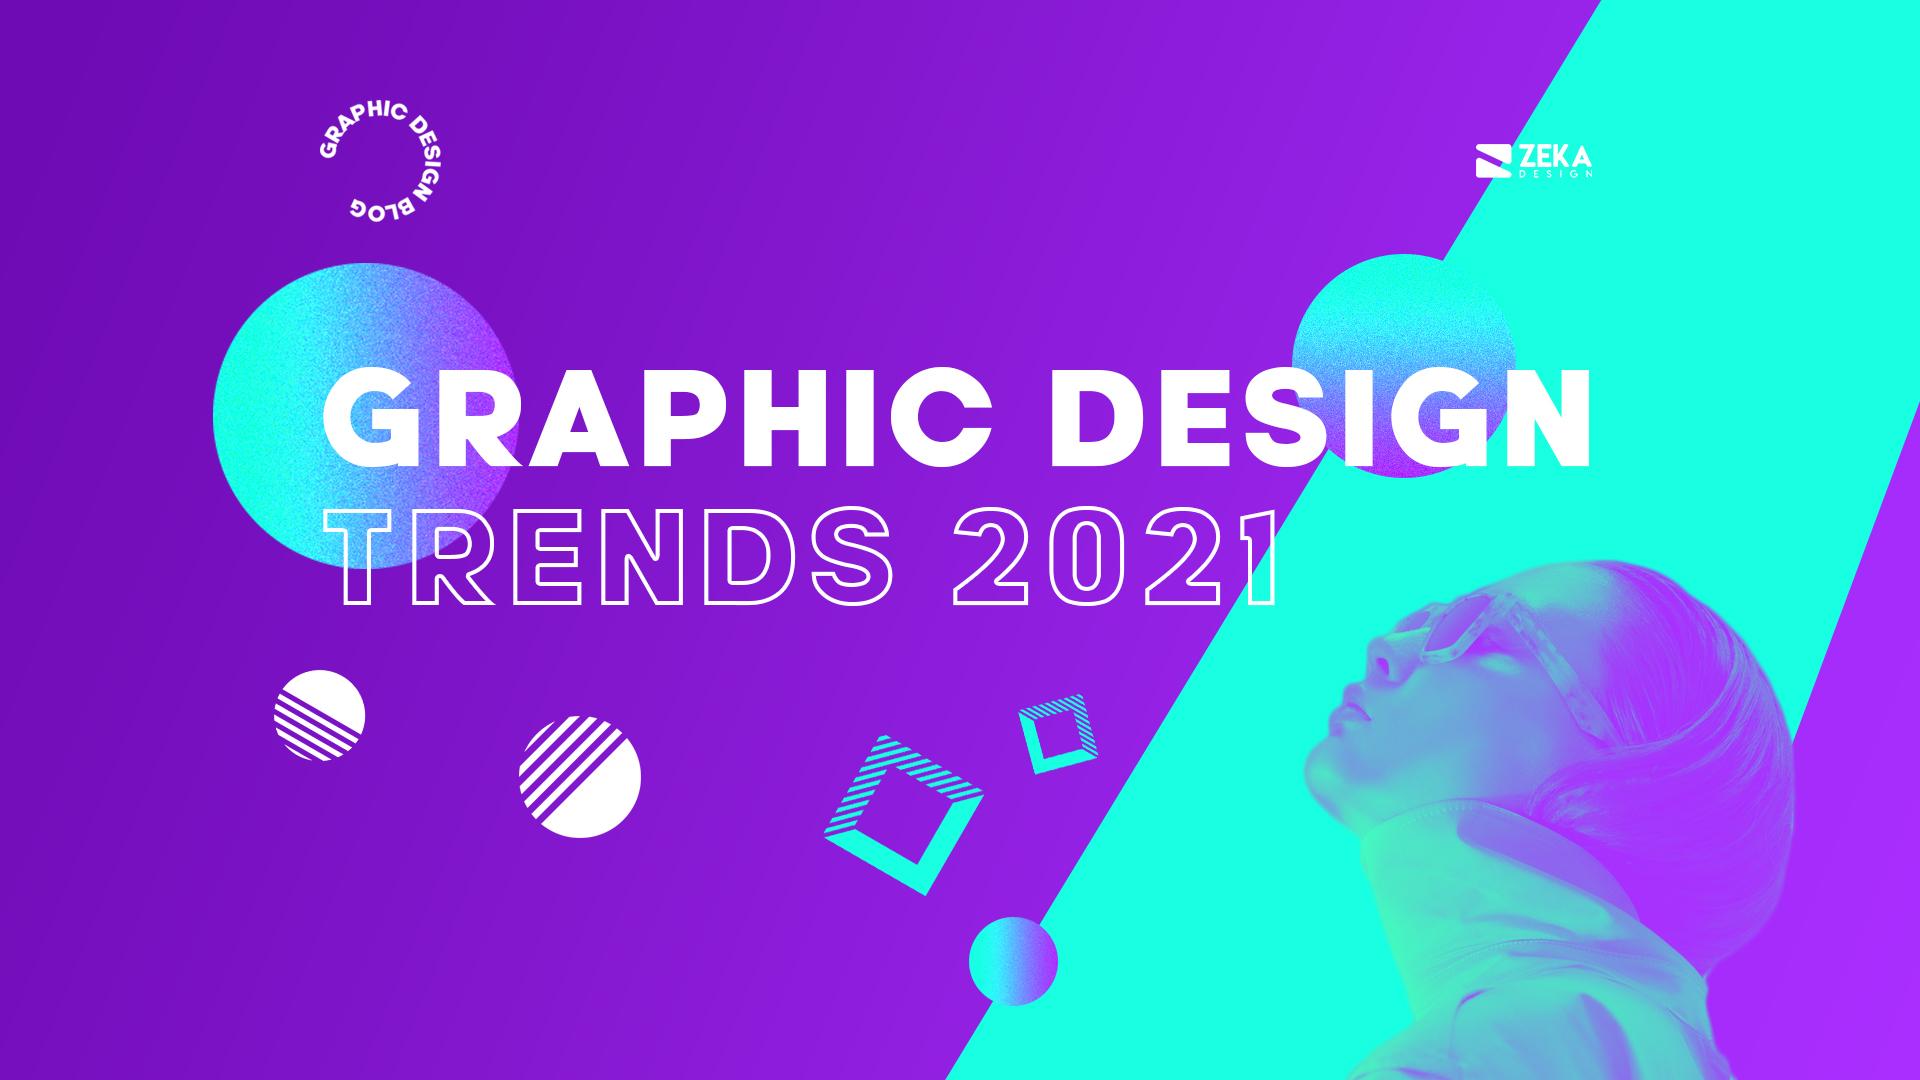 Graphic Design Trends 2021 Inspiration